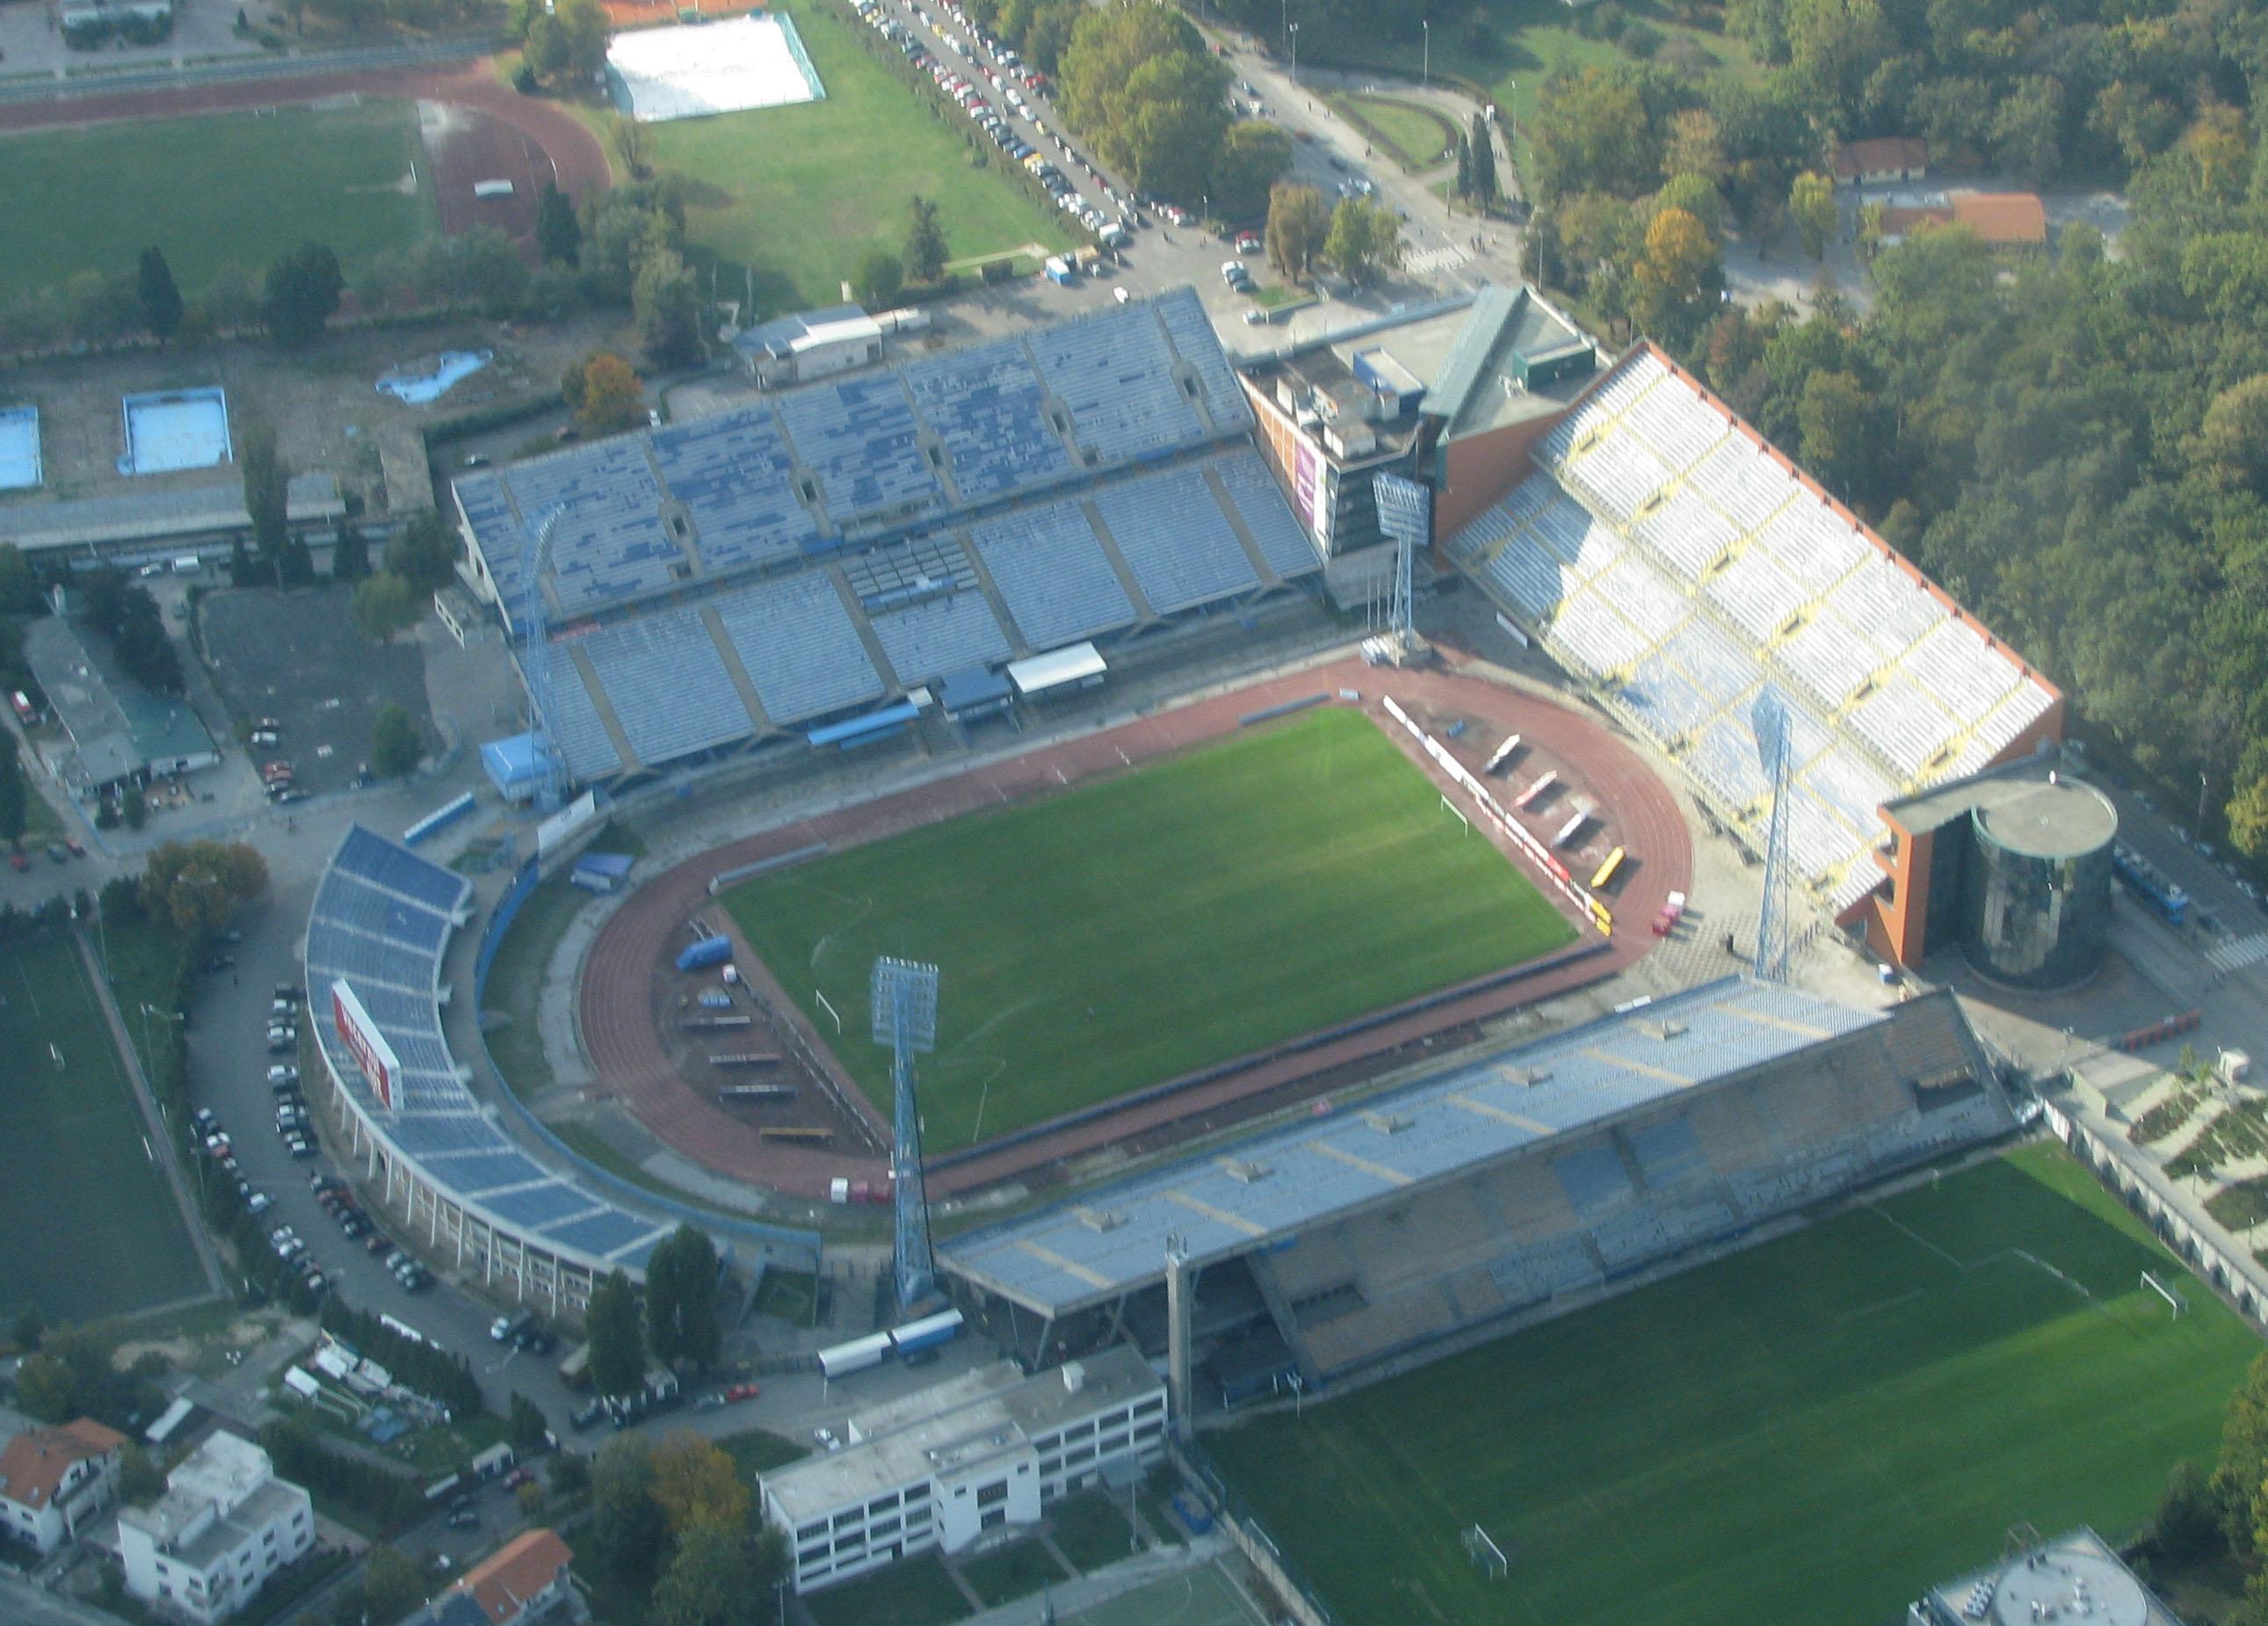 Depiction of Estadio Maksimir